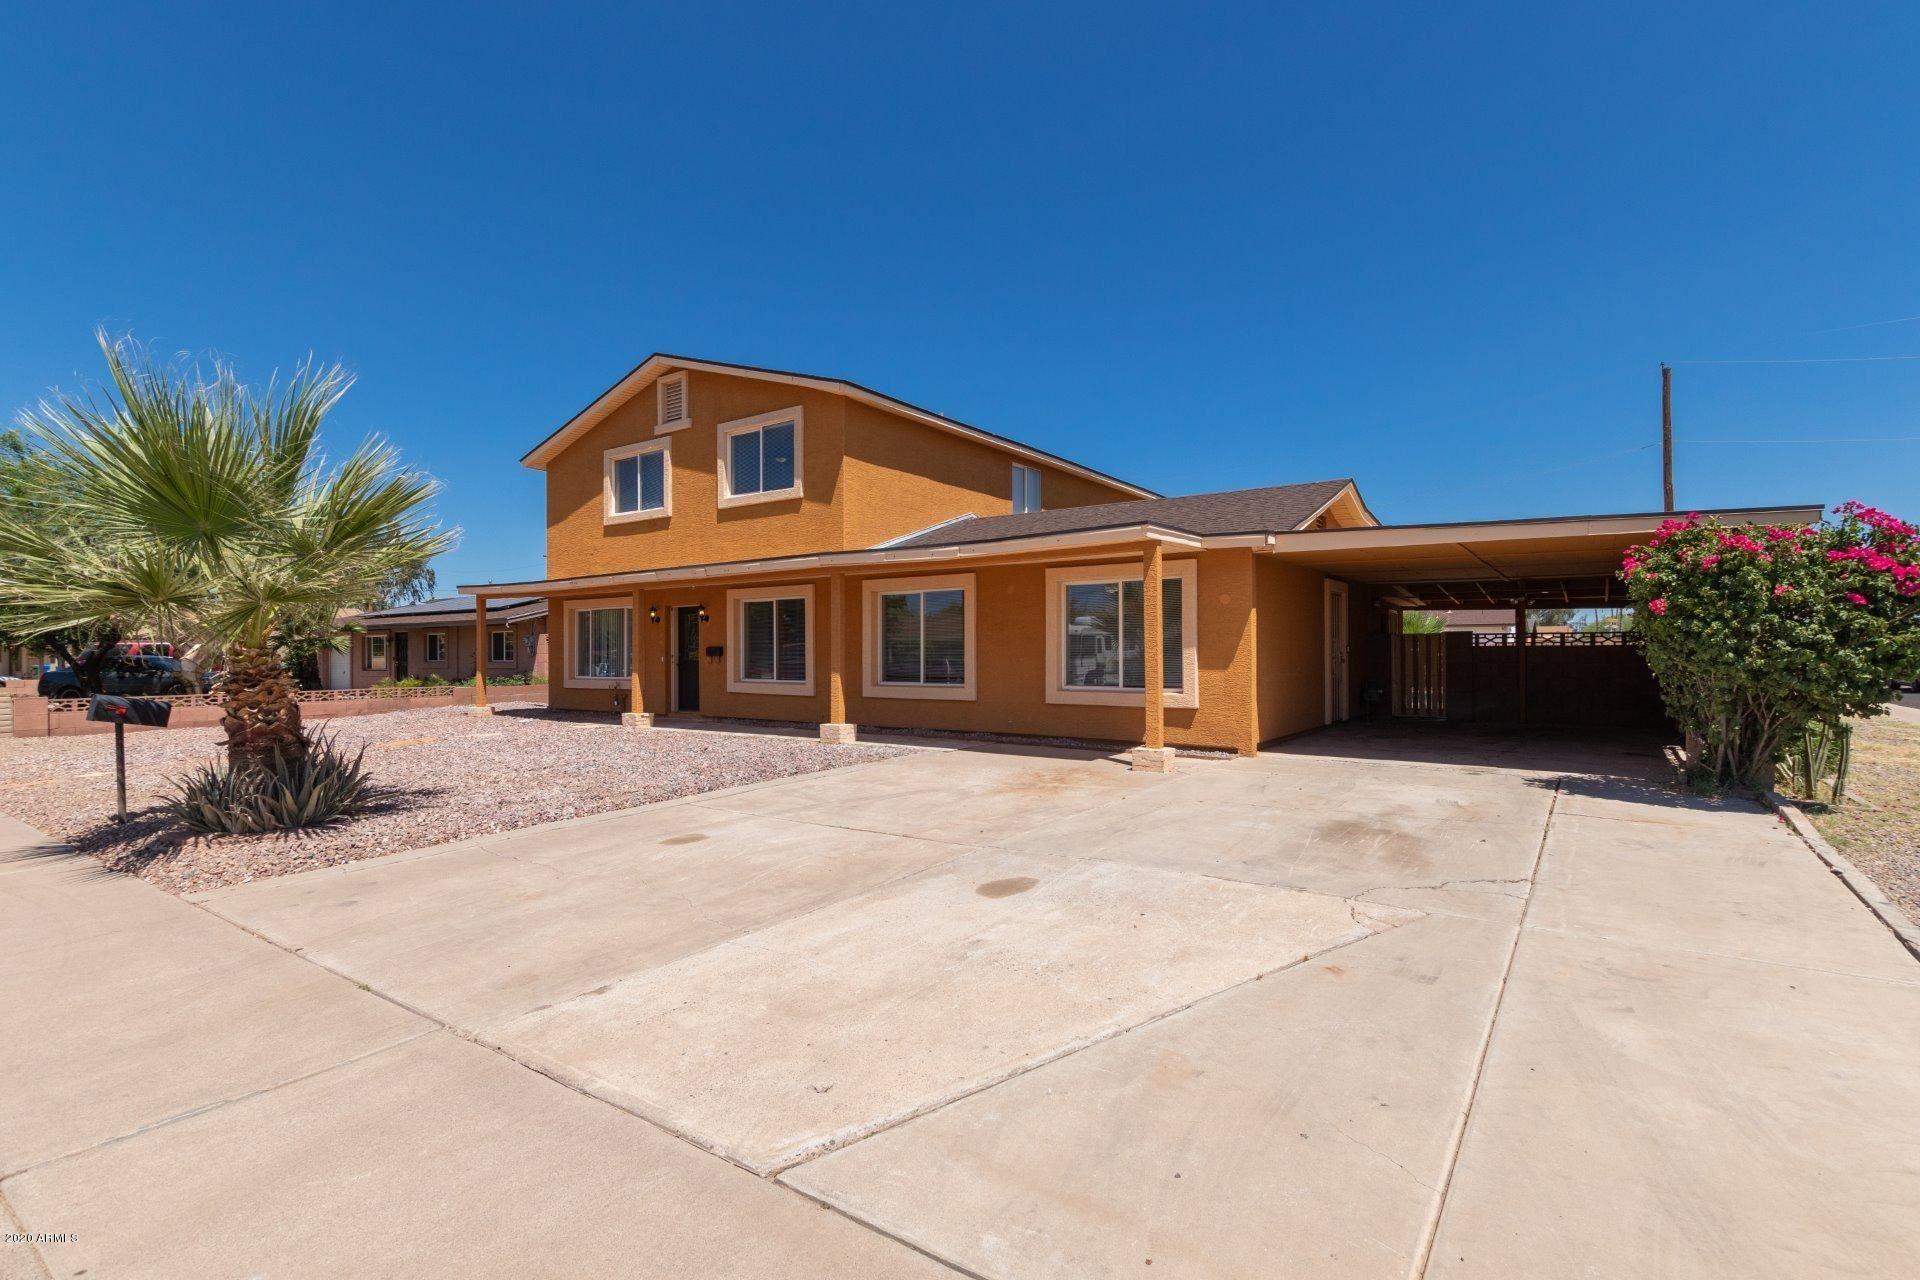 1502 W ANGELA Drive, Phoenix, AZ 85023 - MLS#: 6078980